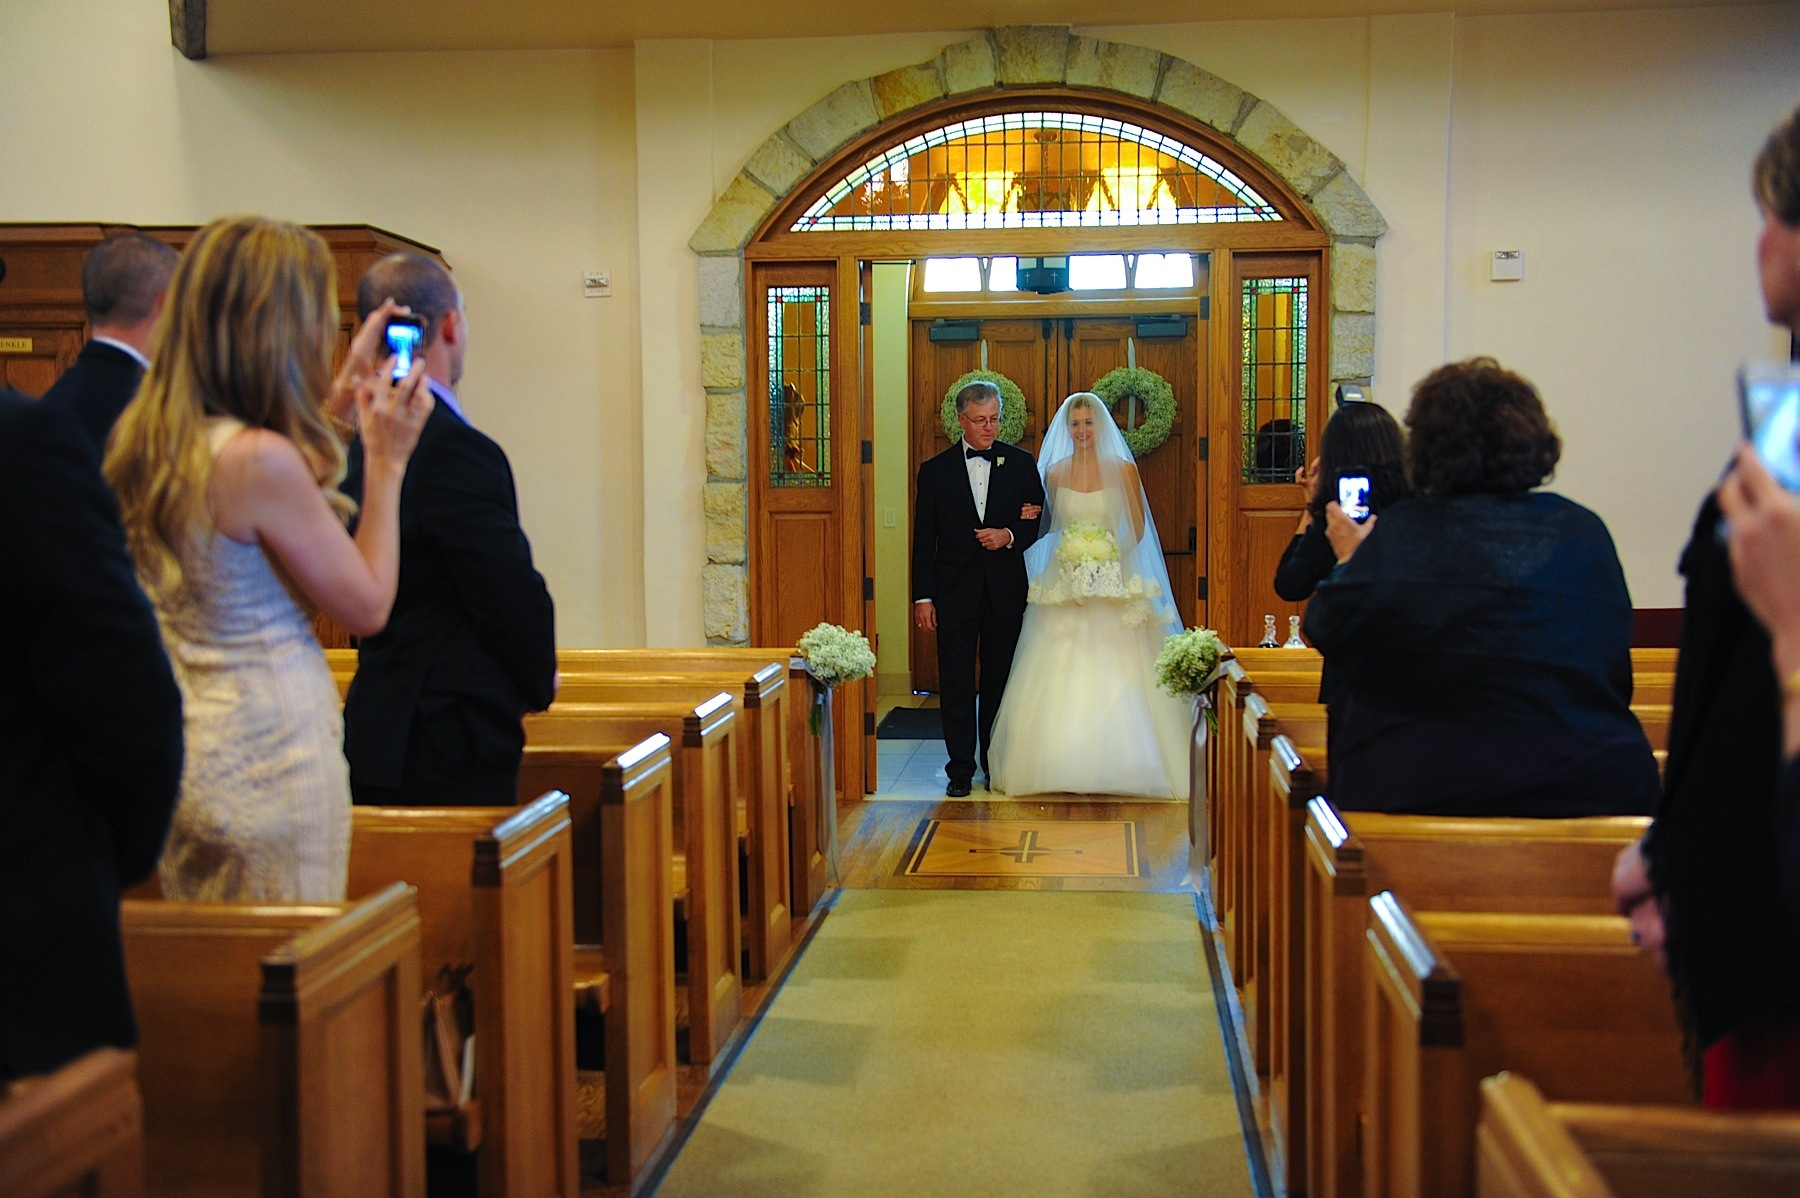 culinary_institute_of_america_napa_valley_wedding_043photographer_